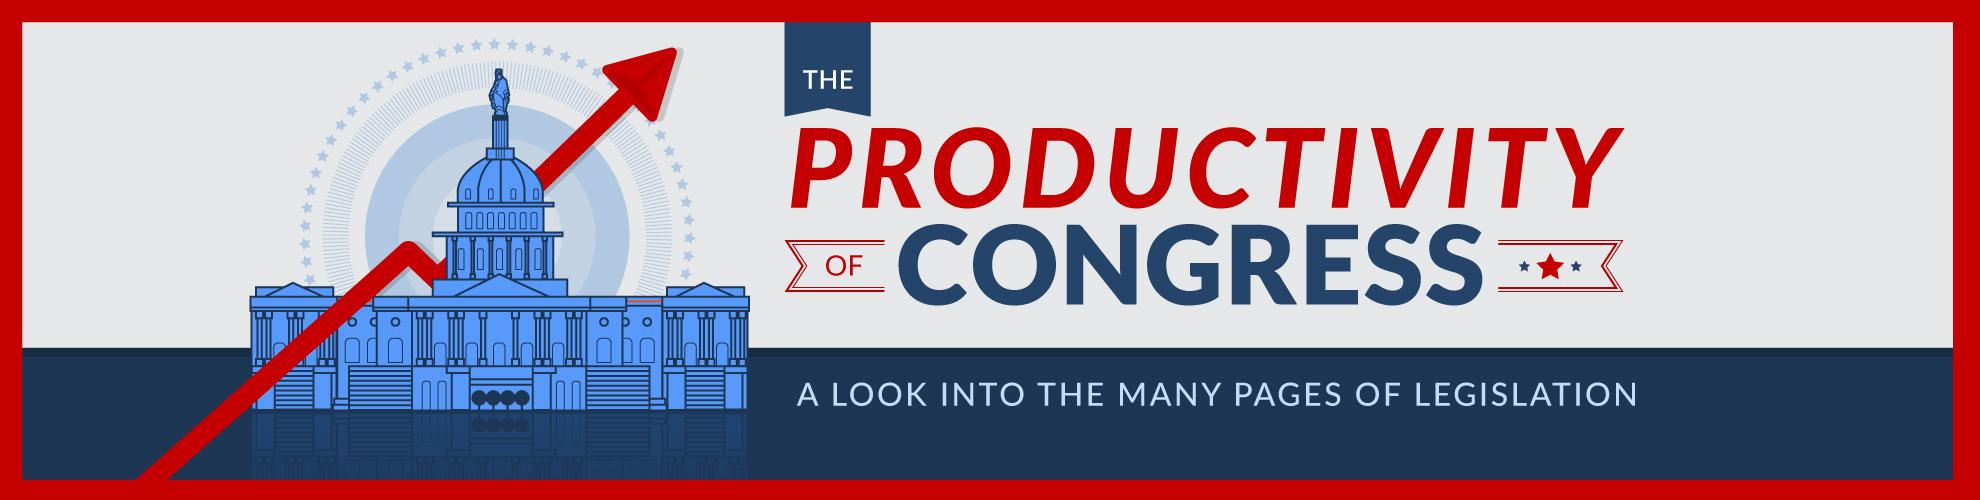 productivity-of-congress-header